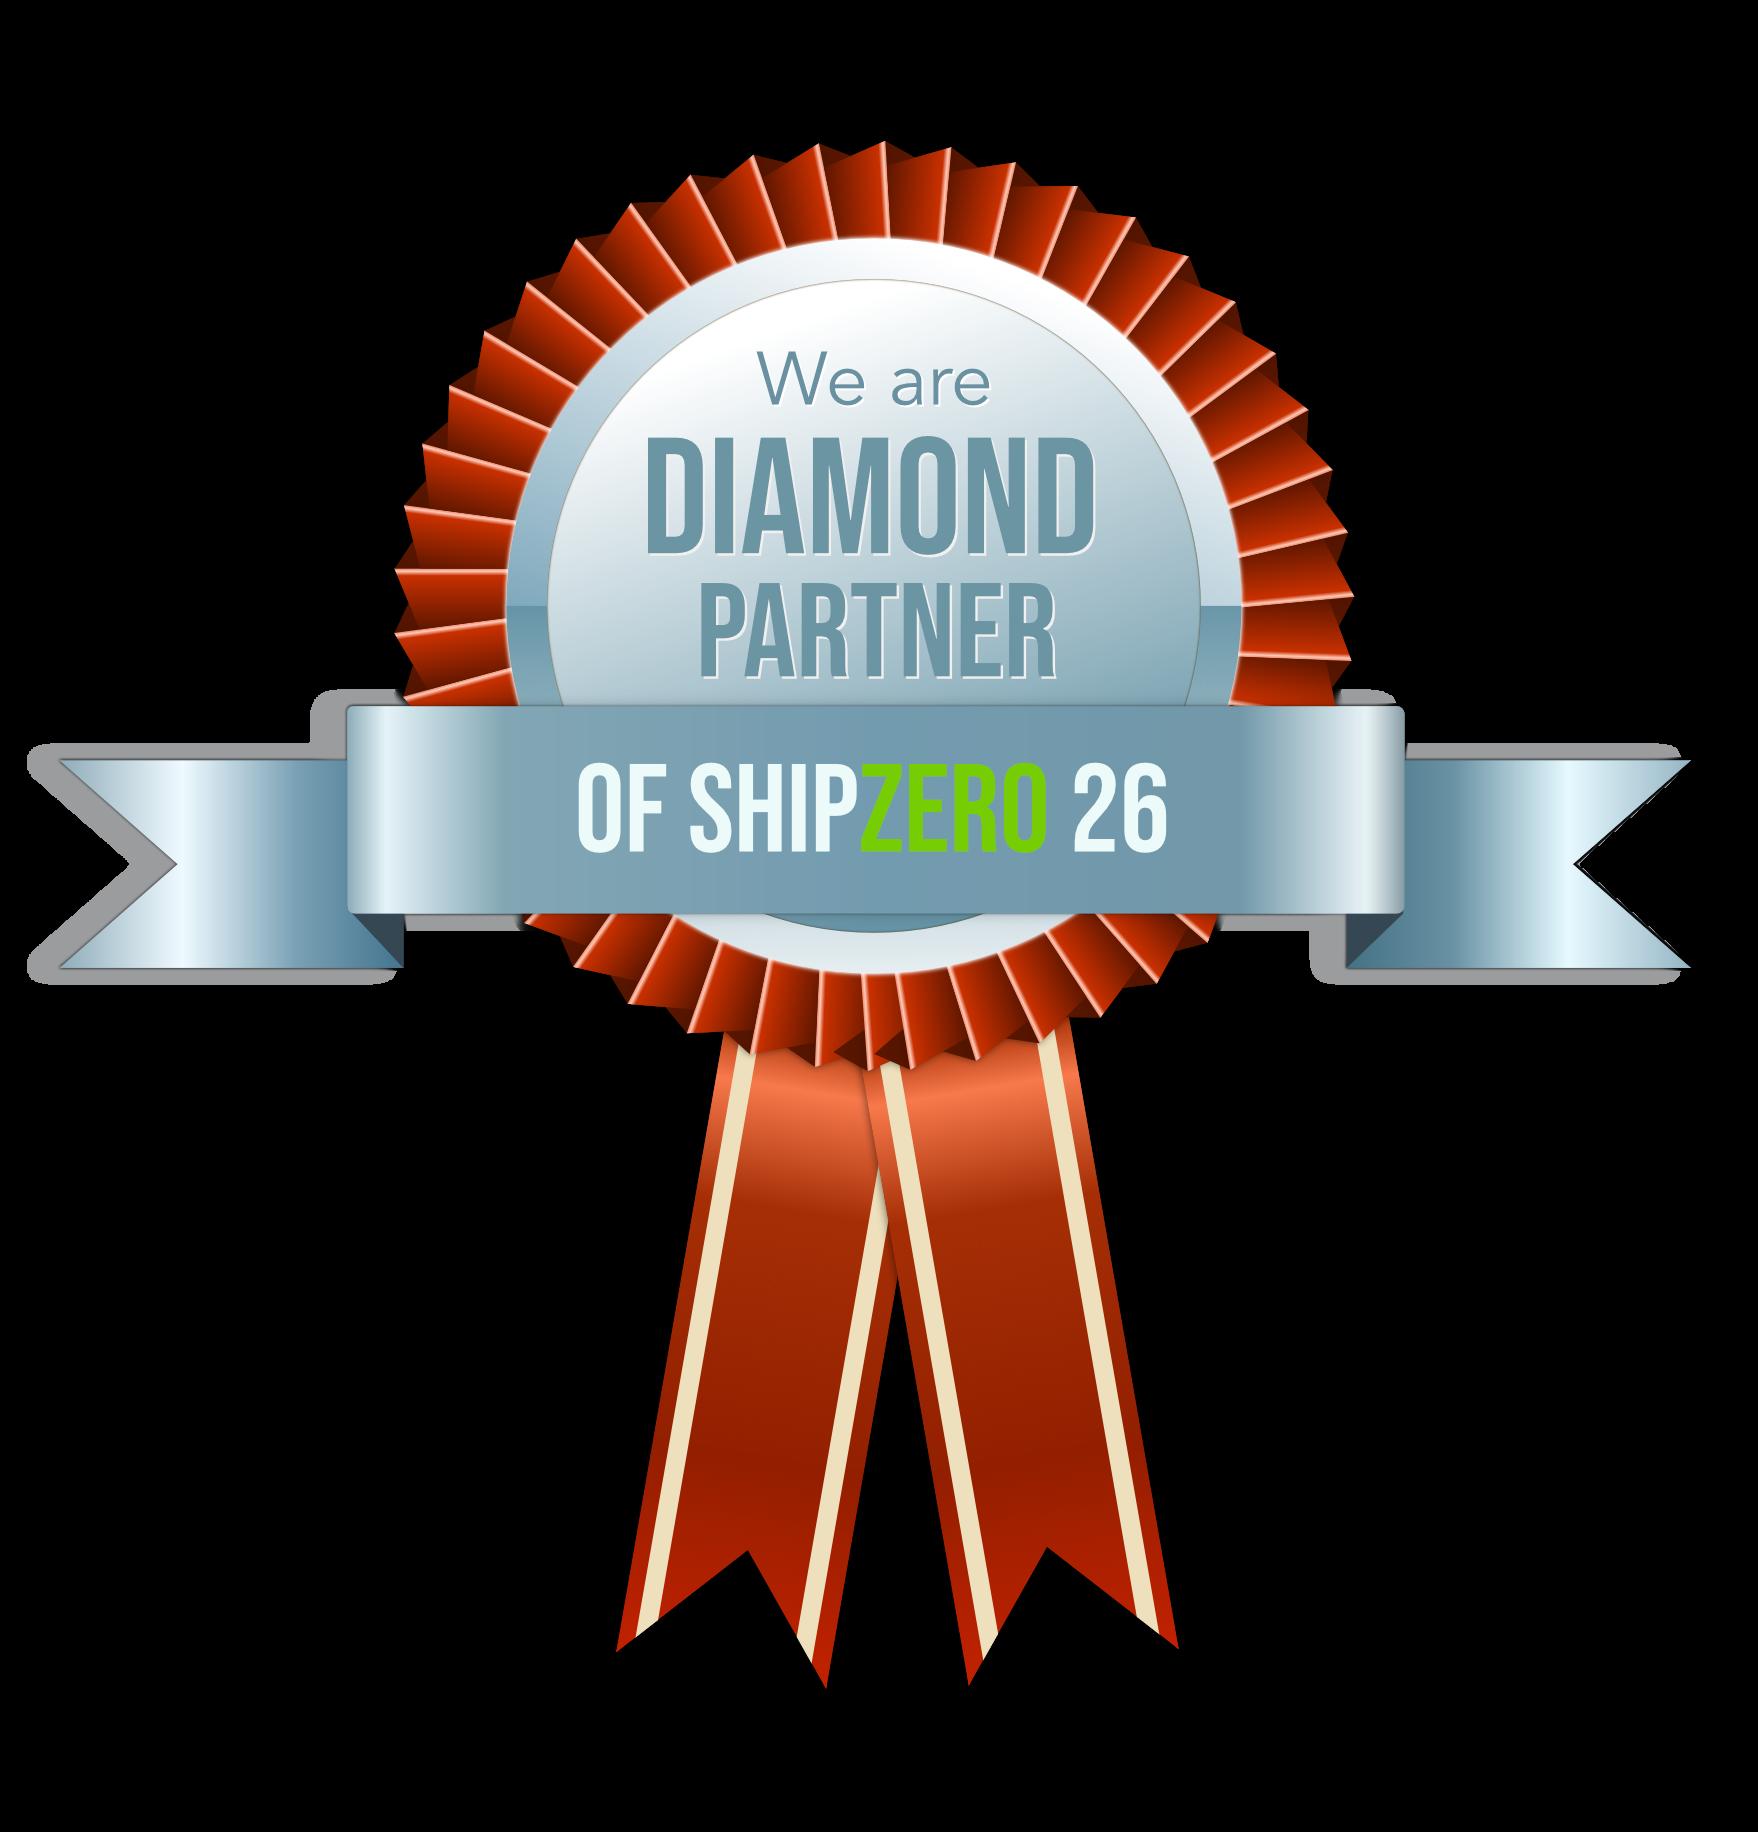 DIAMOND Partner badge